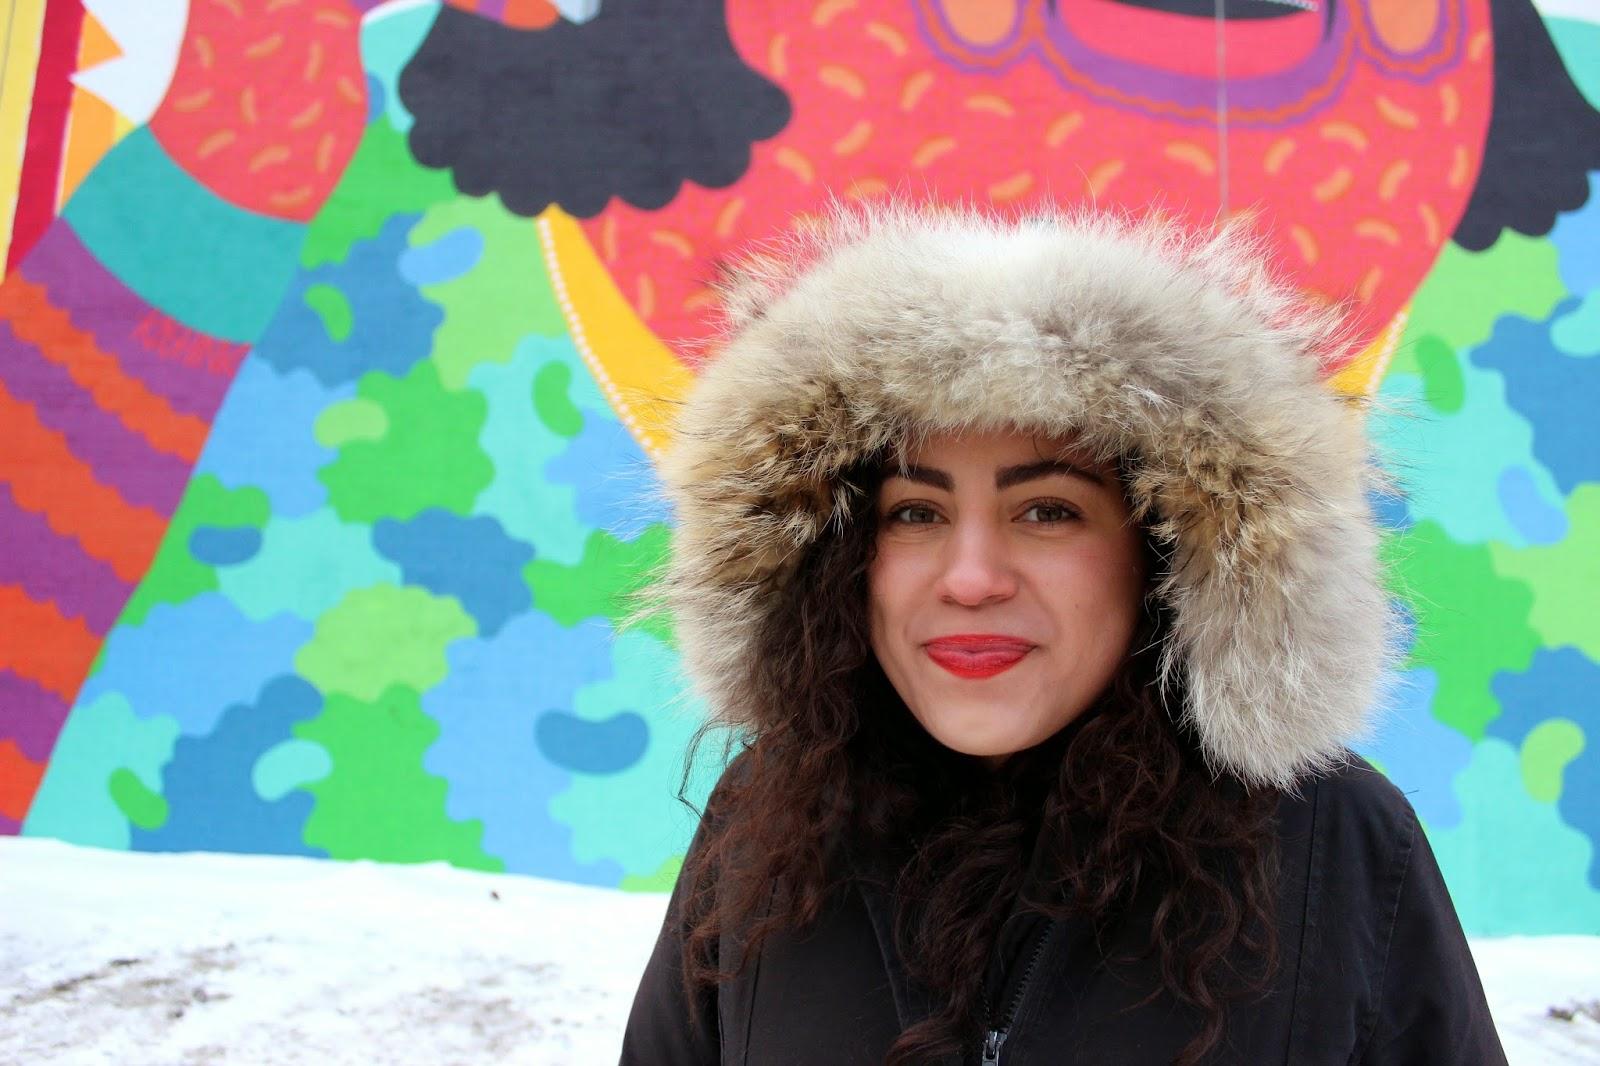 mac red lips marilyn monroe KASHINK street art mural festival fashion blog st laurent nightlife montreal bars canada goose fashion style  canada goose in my j brand